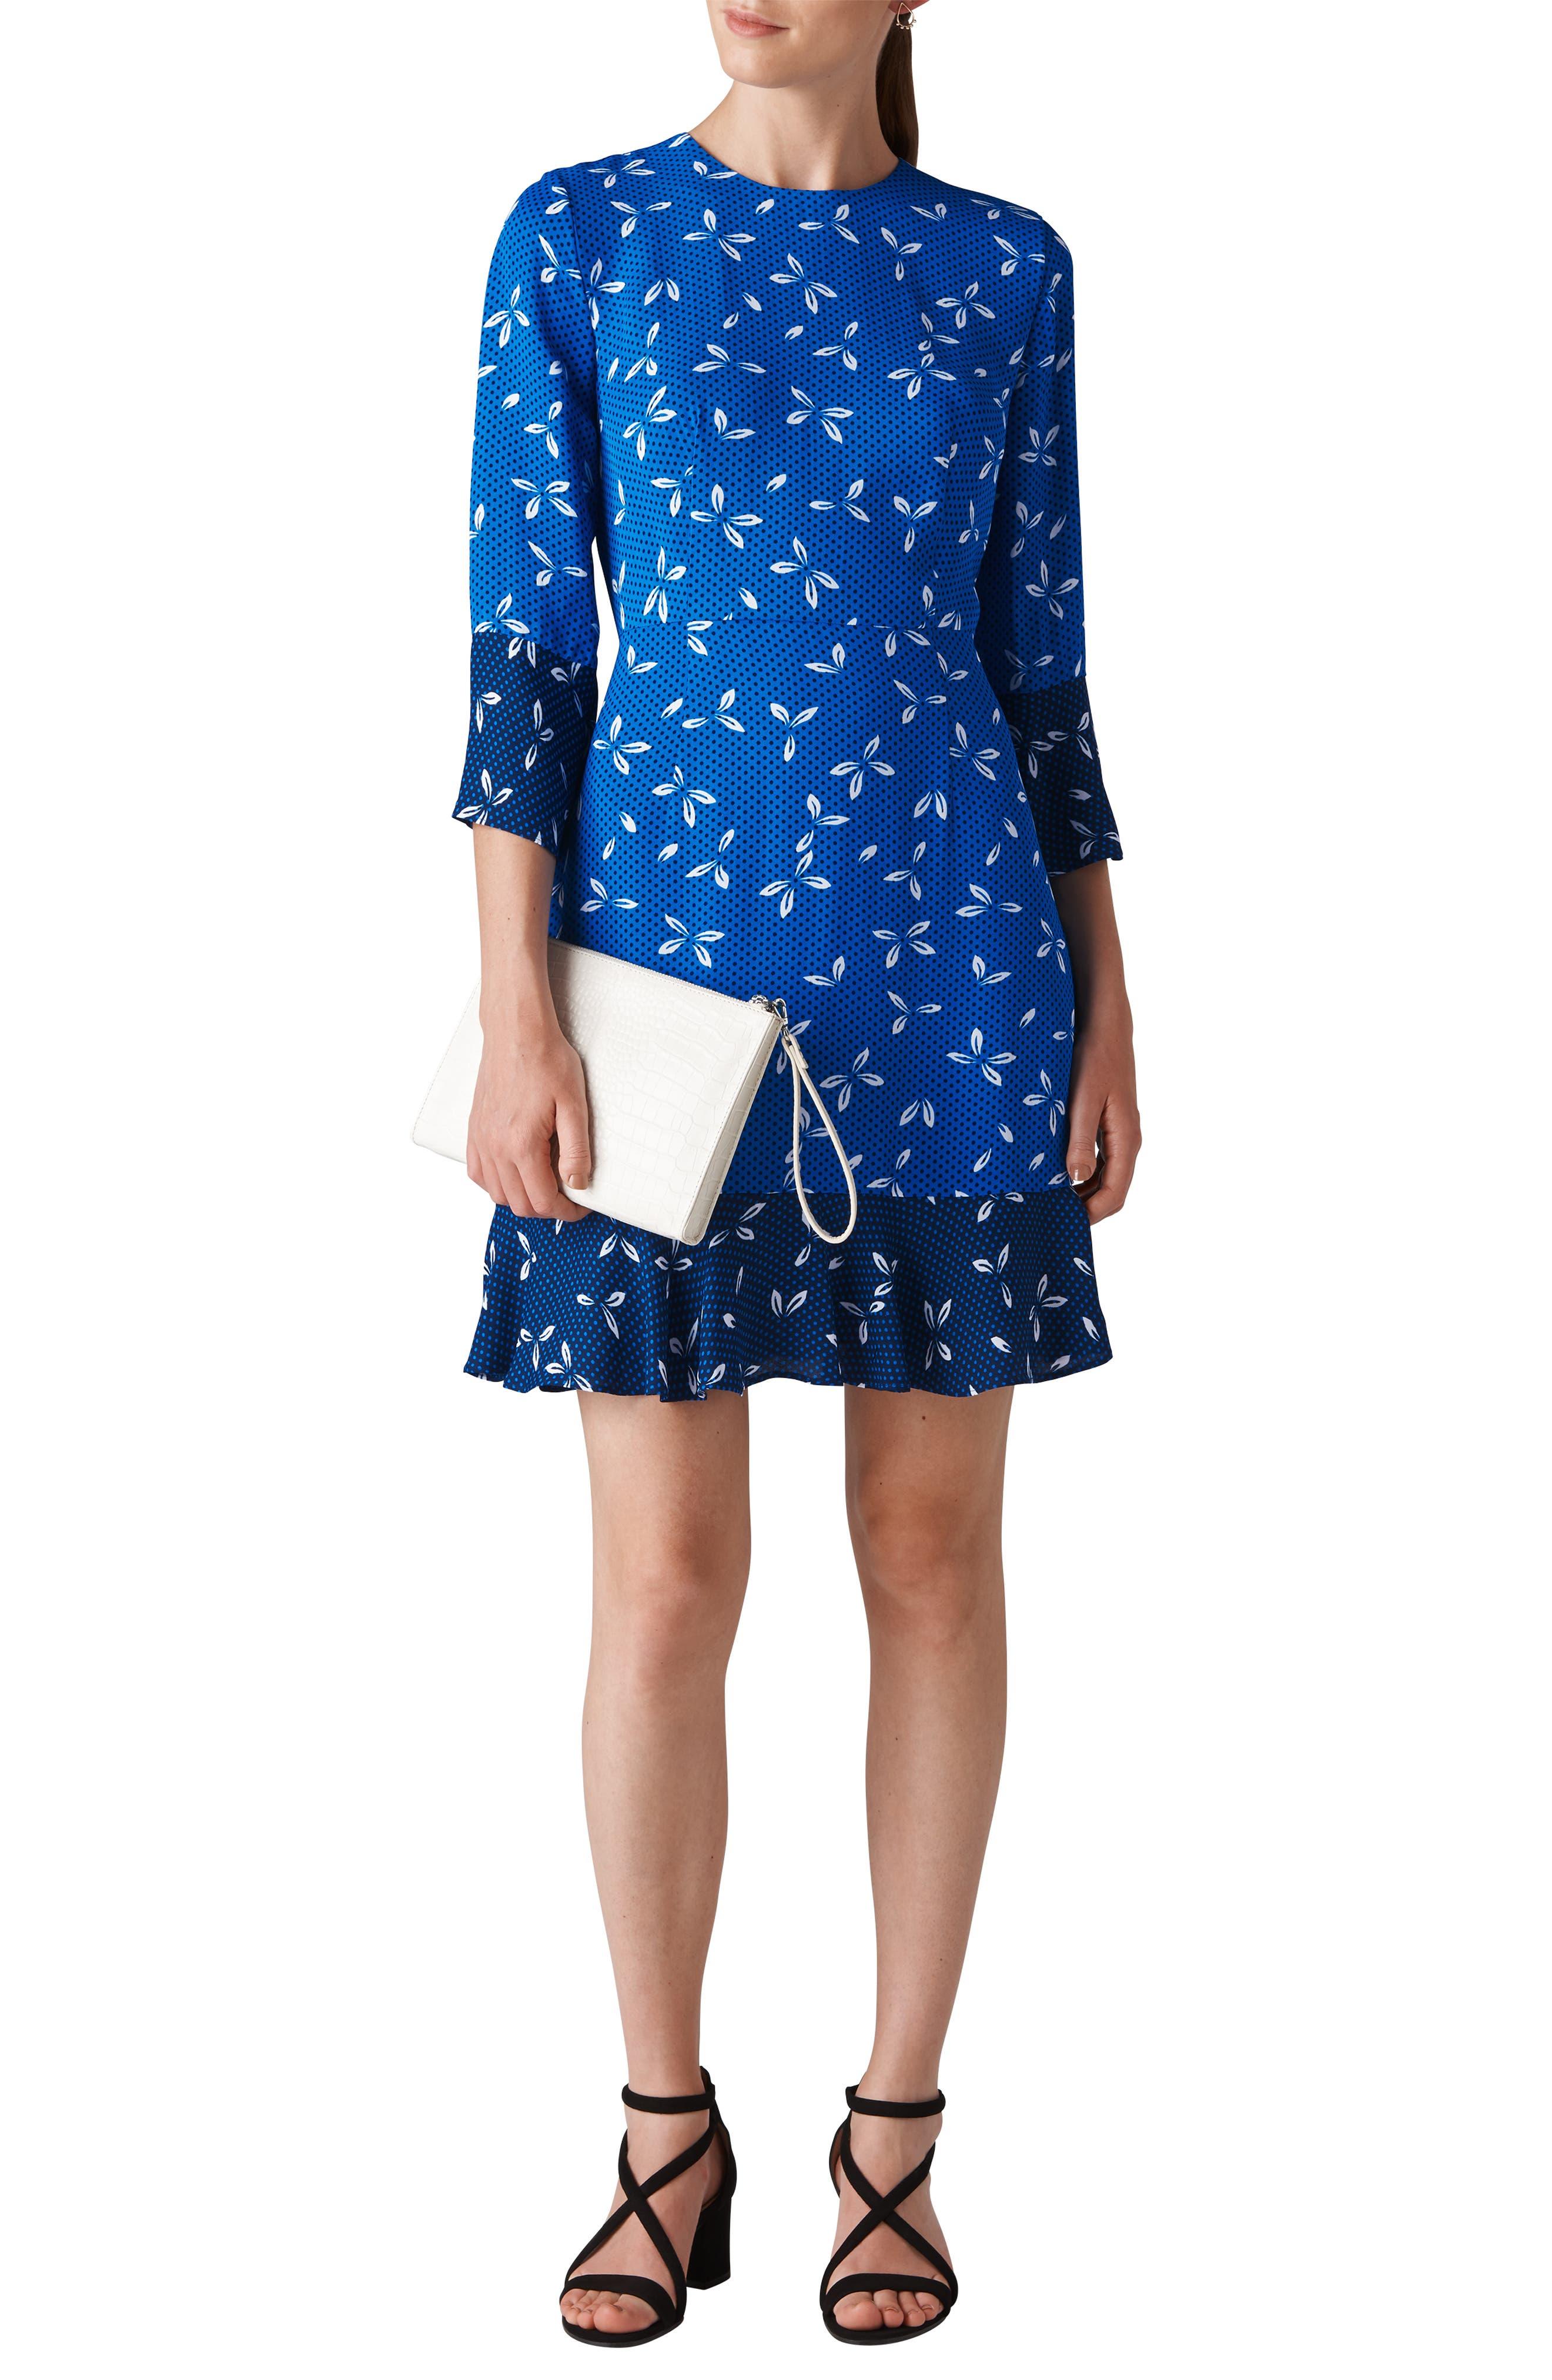 Polly Spot Print Dress,                         Main,                         color, BLUE/ MULTI